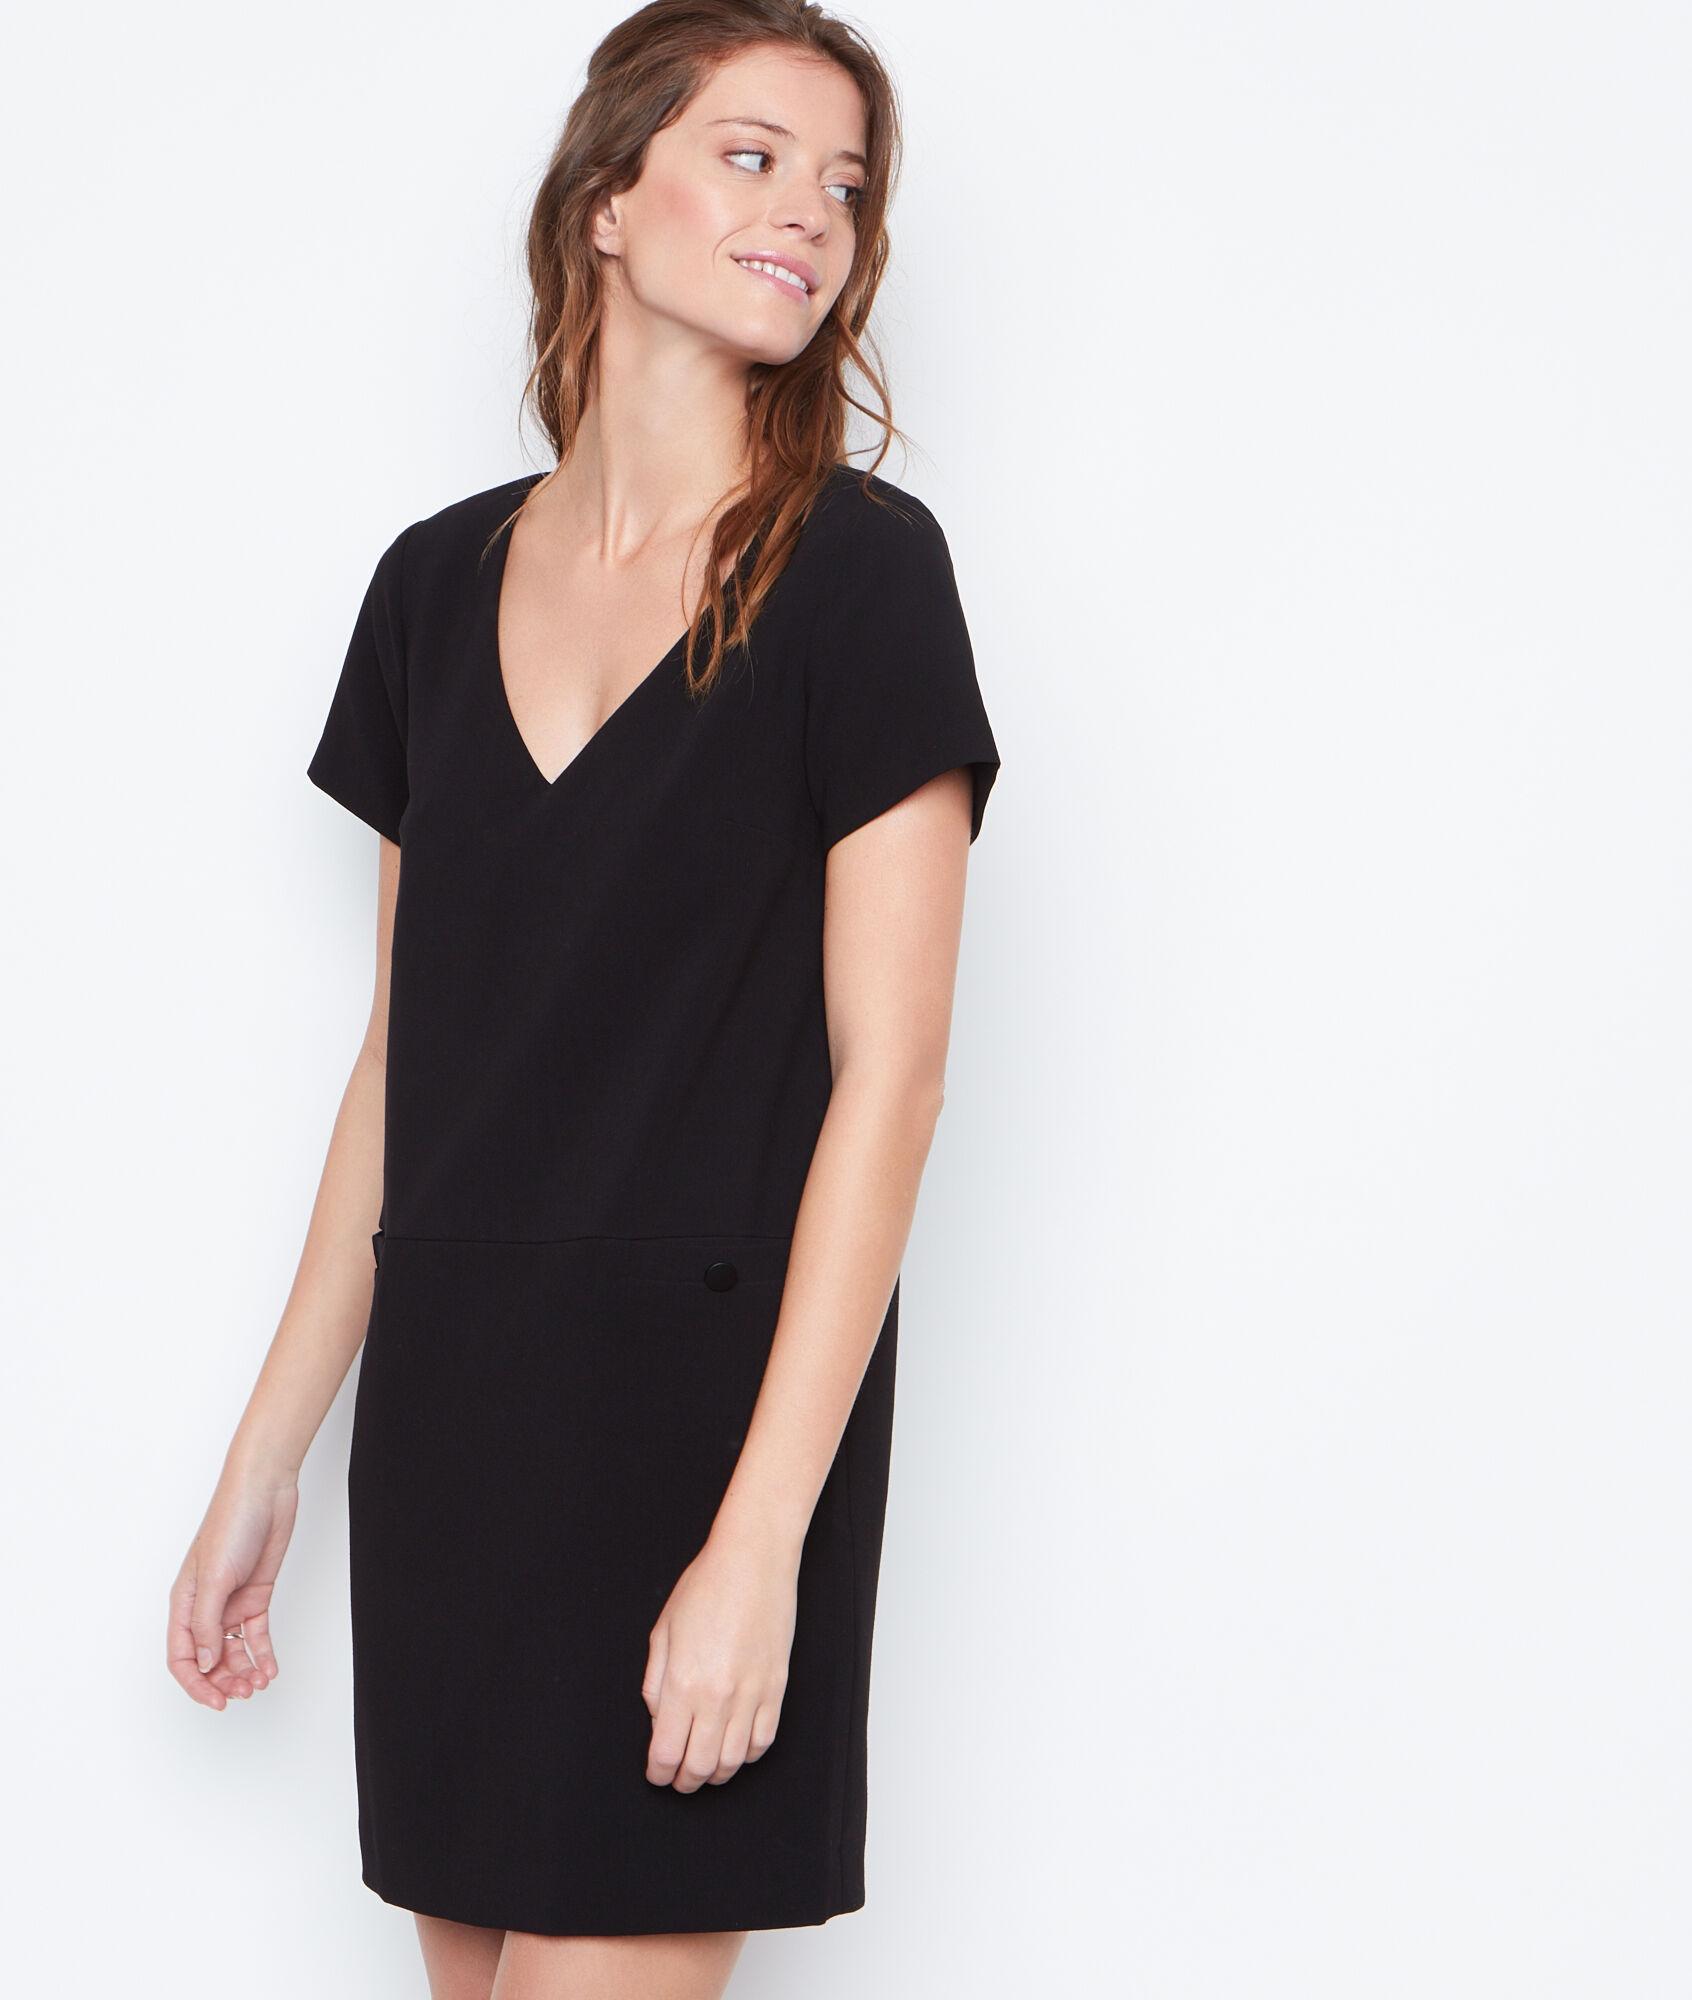 Petite robe noire etam